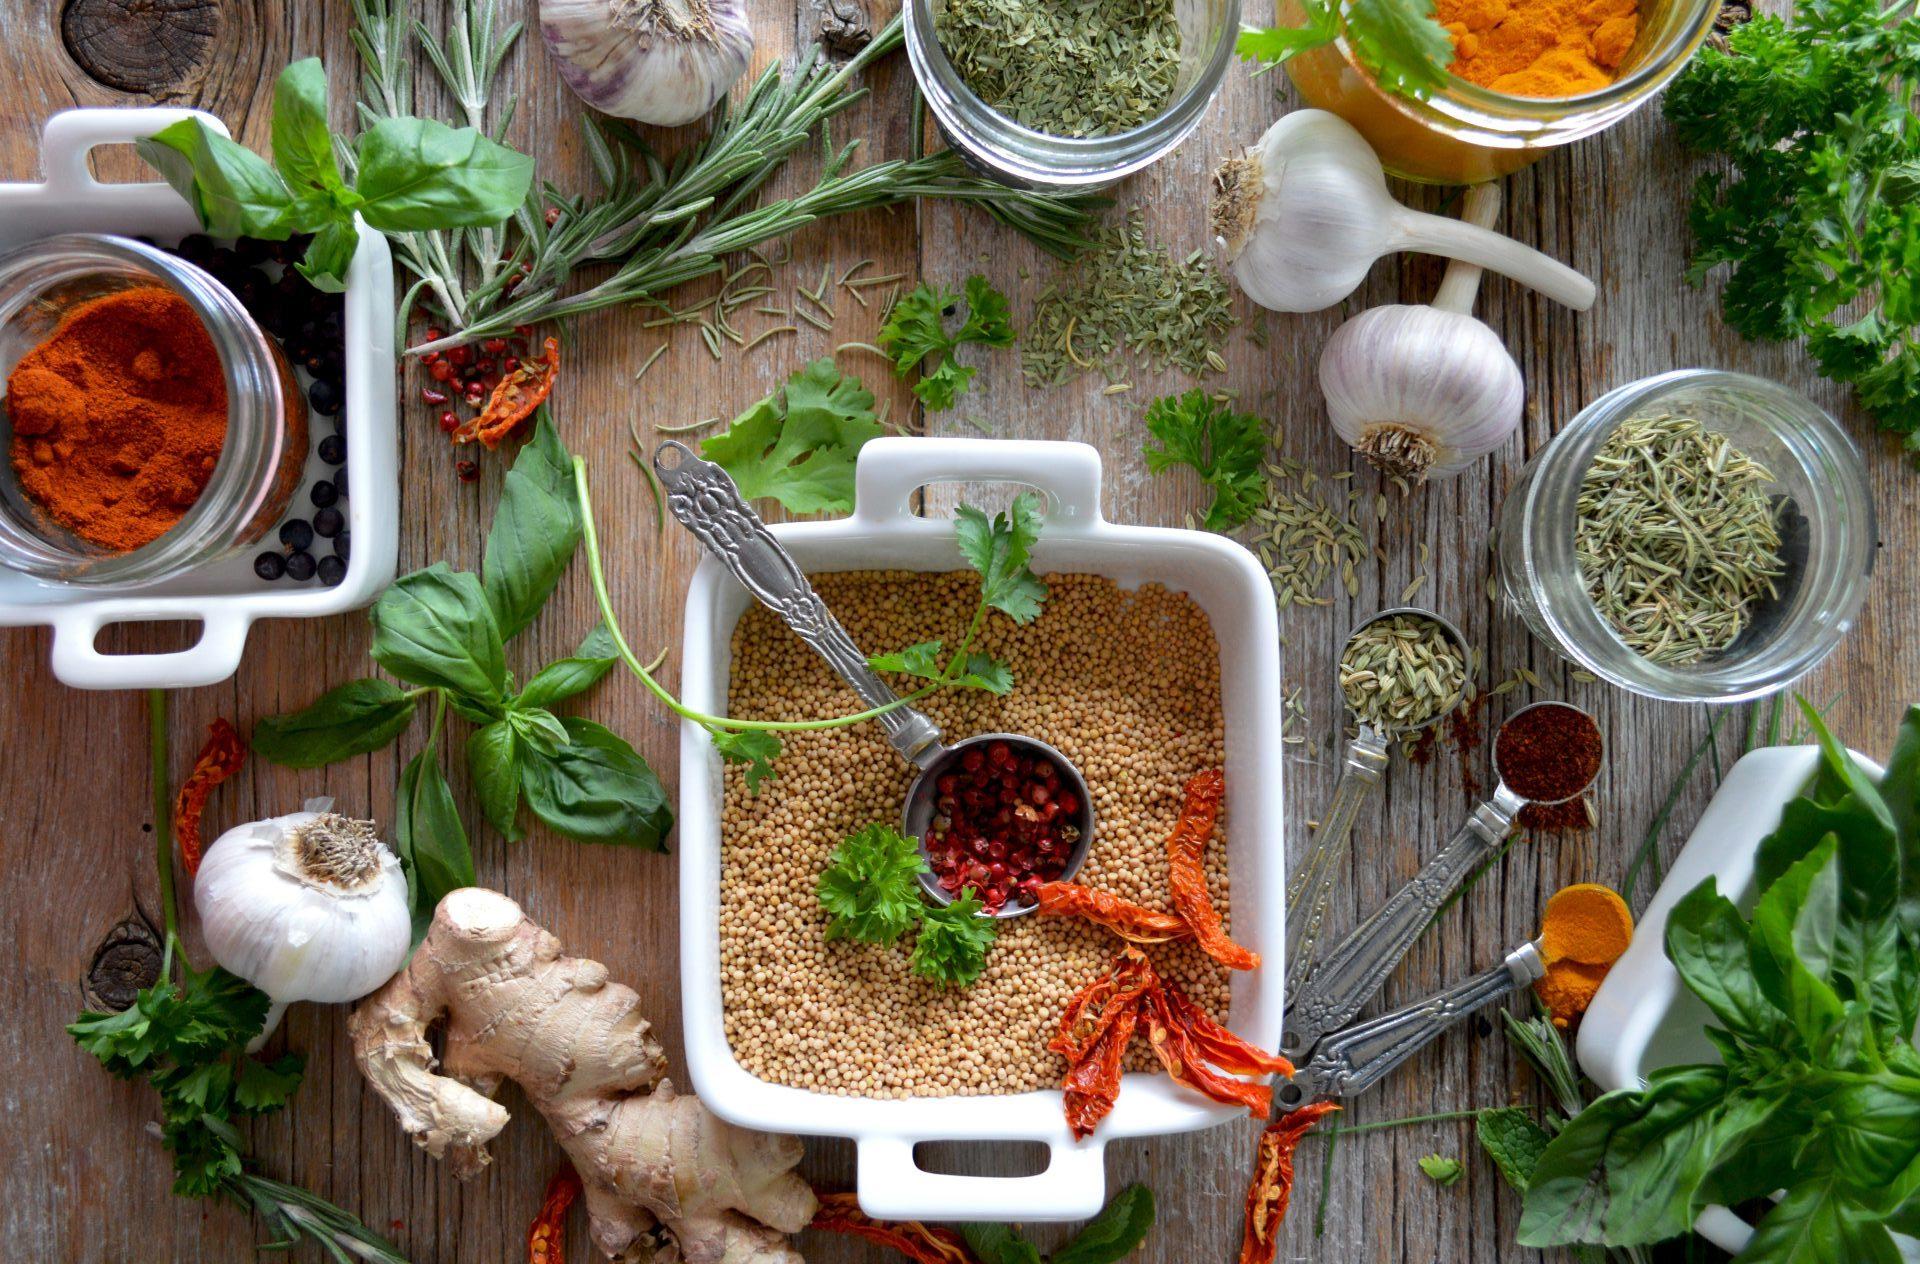 ALTONAtives Kochen im HausDrei